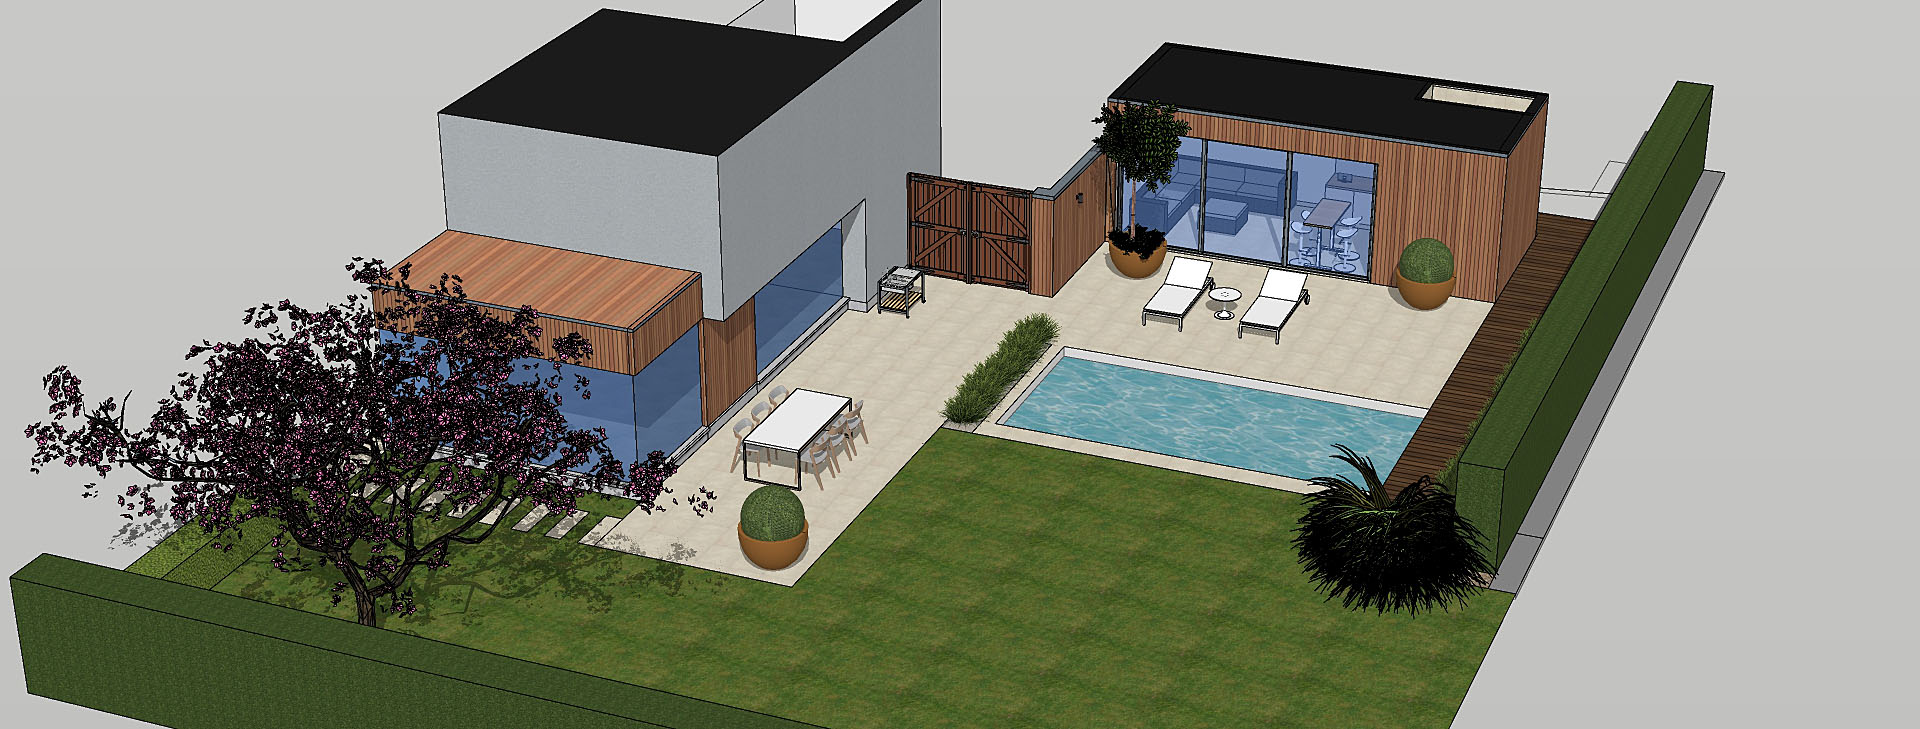 projet 3d petite piscine